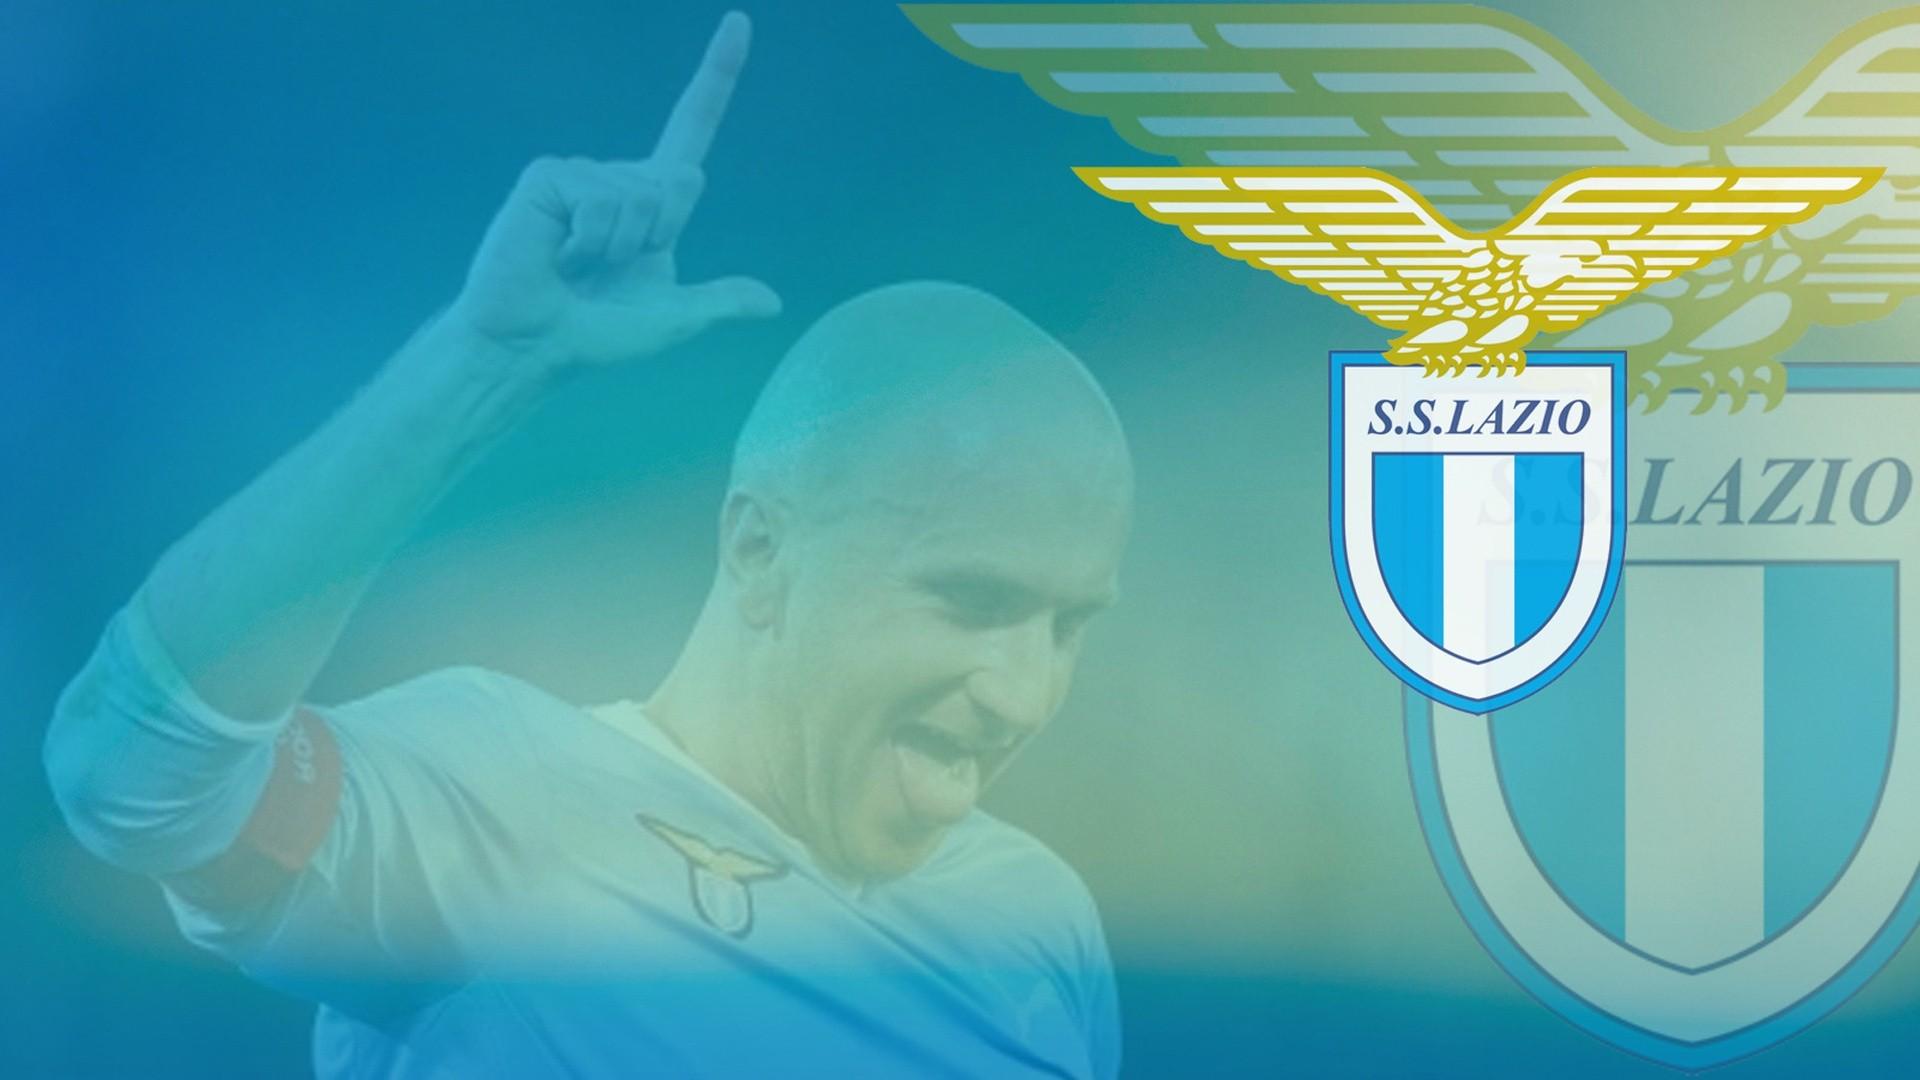 General 1920x1080 Tommaso Rocchi men soccer logo blue background